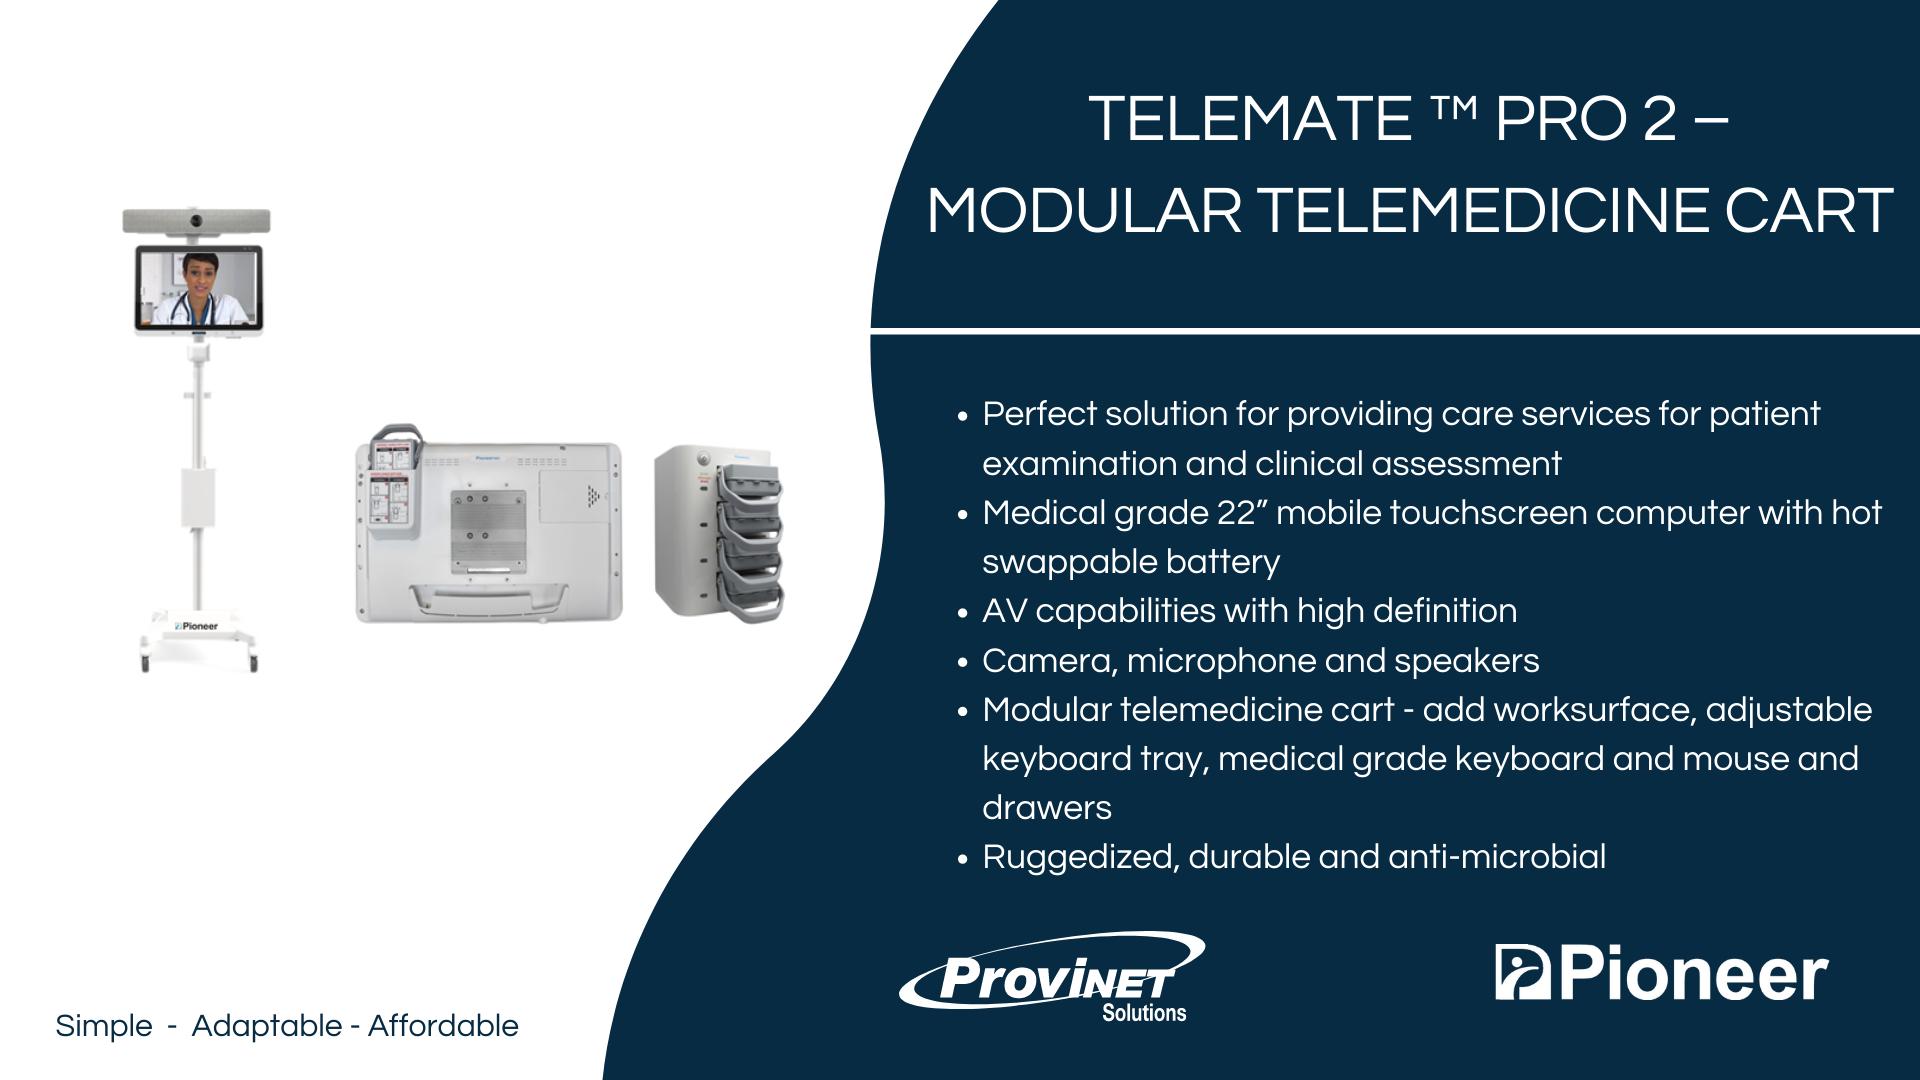 TeleMate ™ PRO 2 – Modular Telemedicine Cart